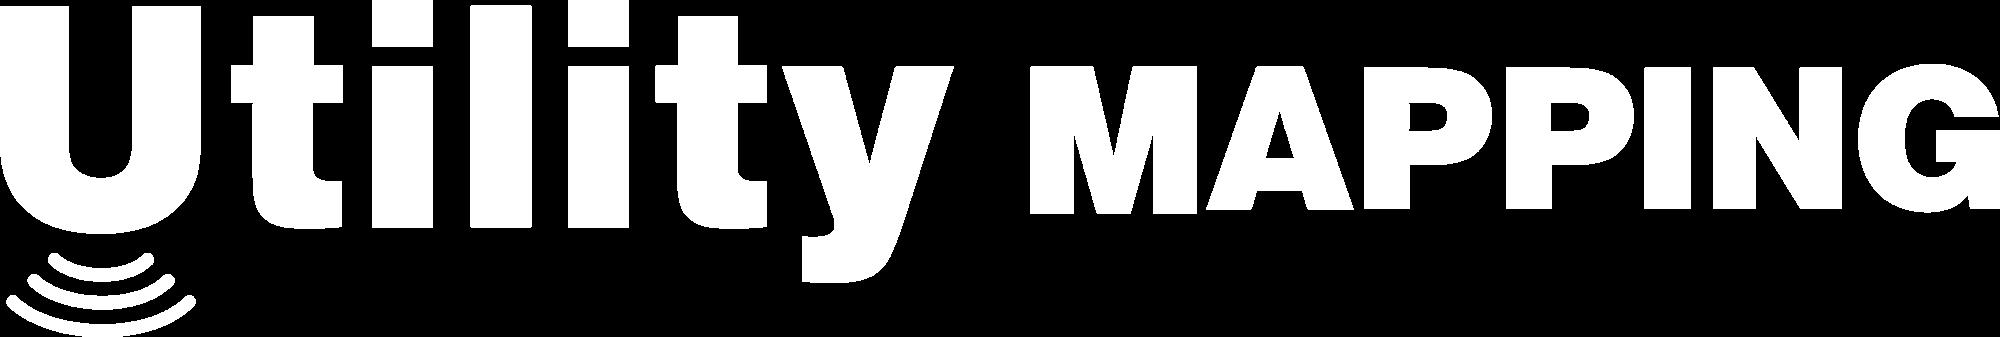 U-Mapping